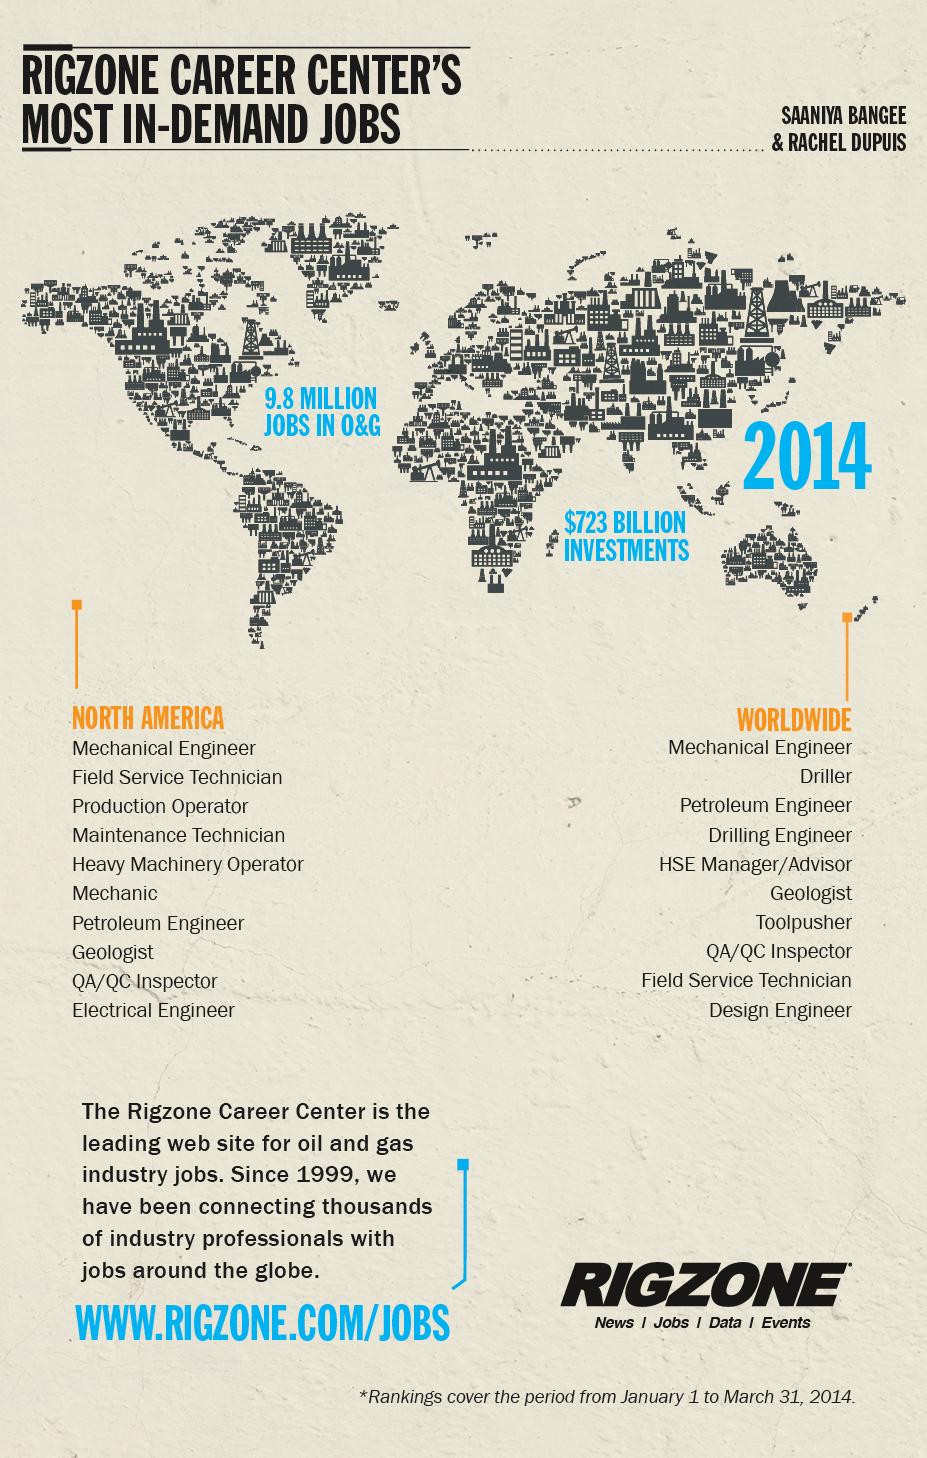 jobs_infographic_132818.jpg